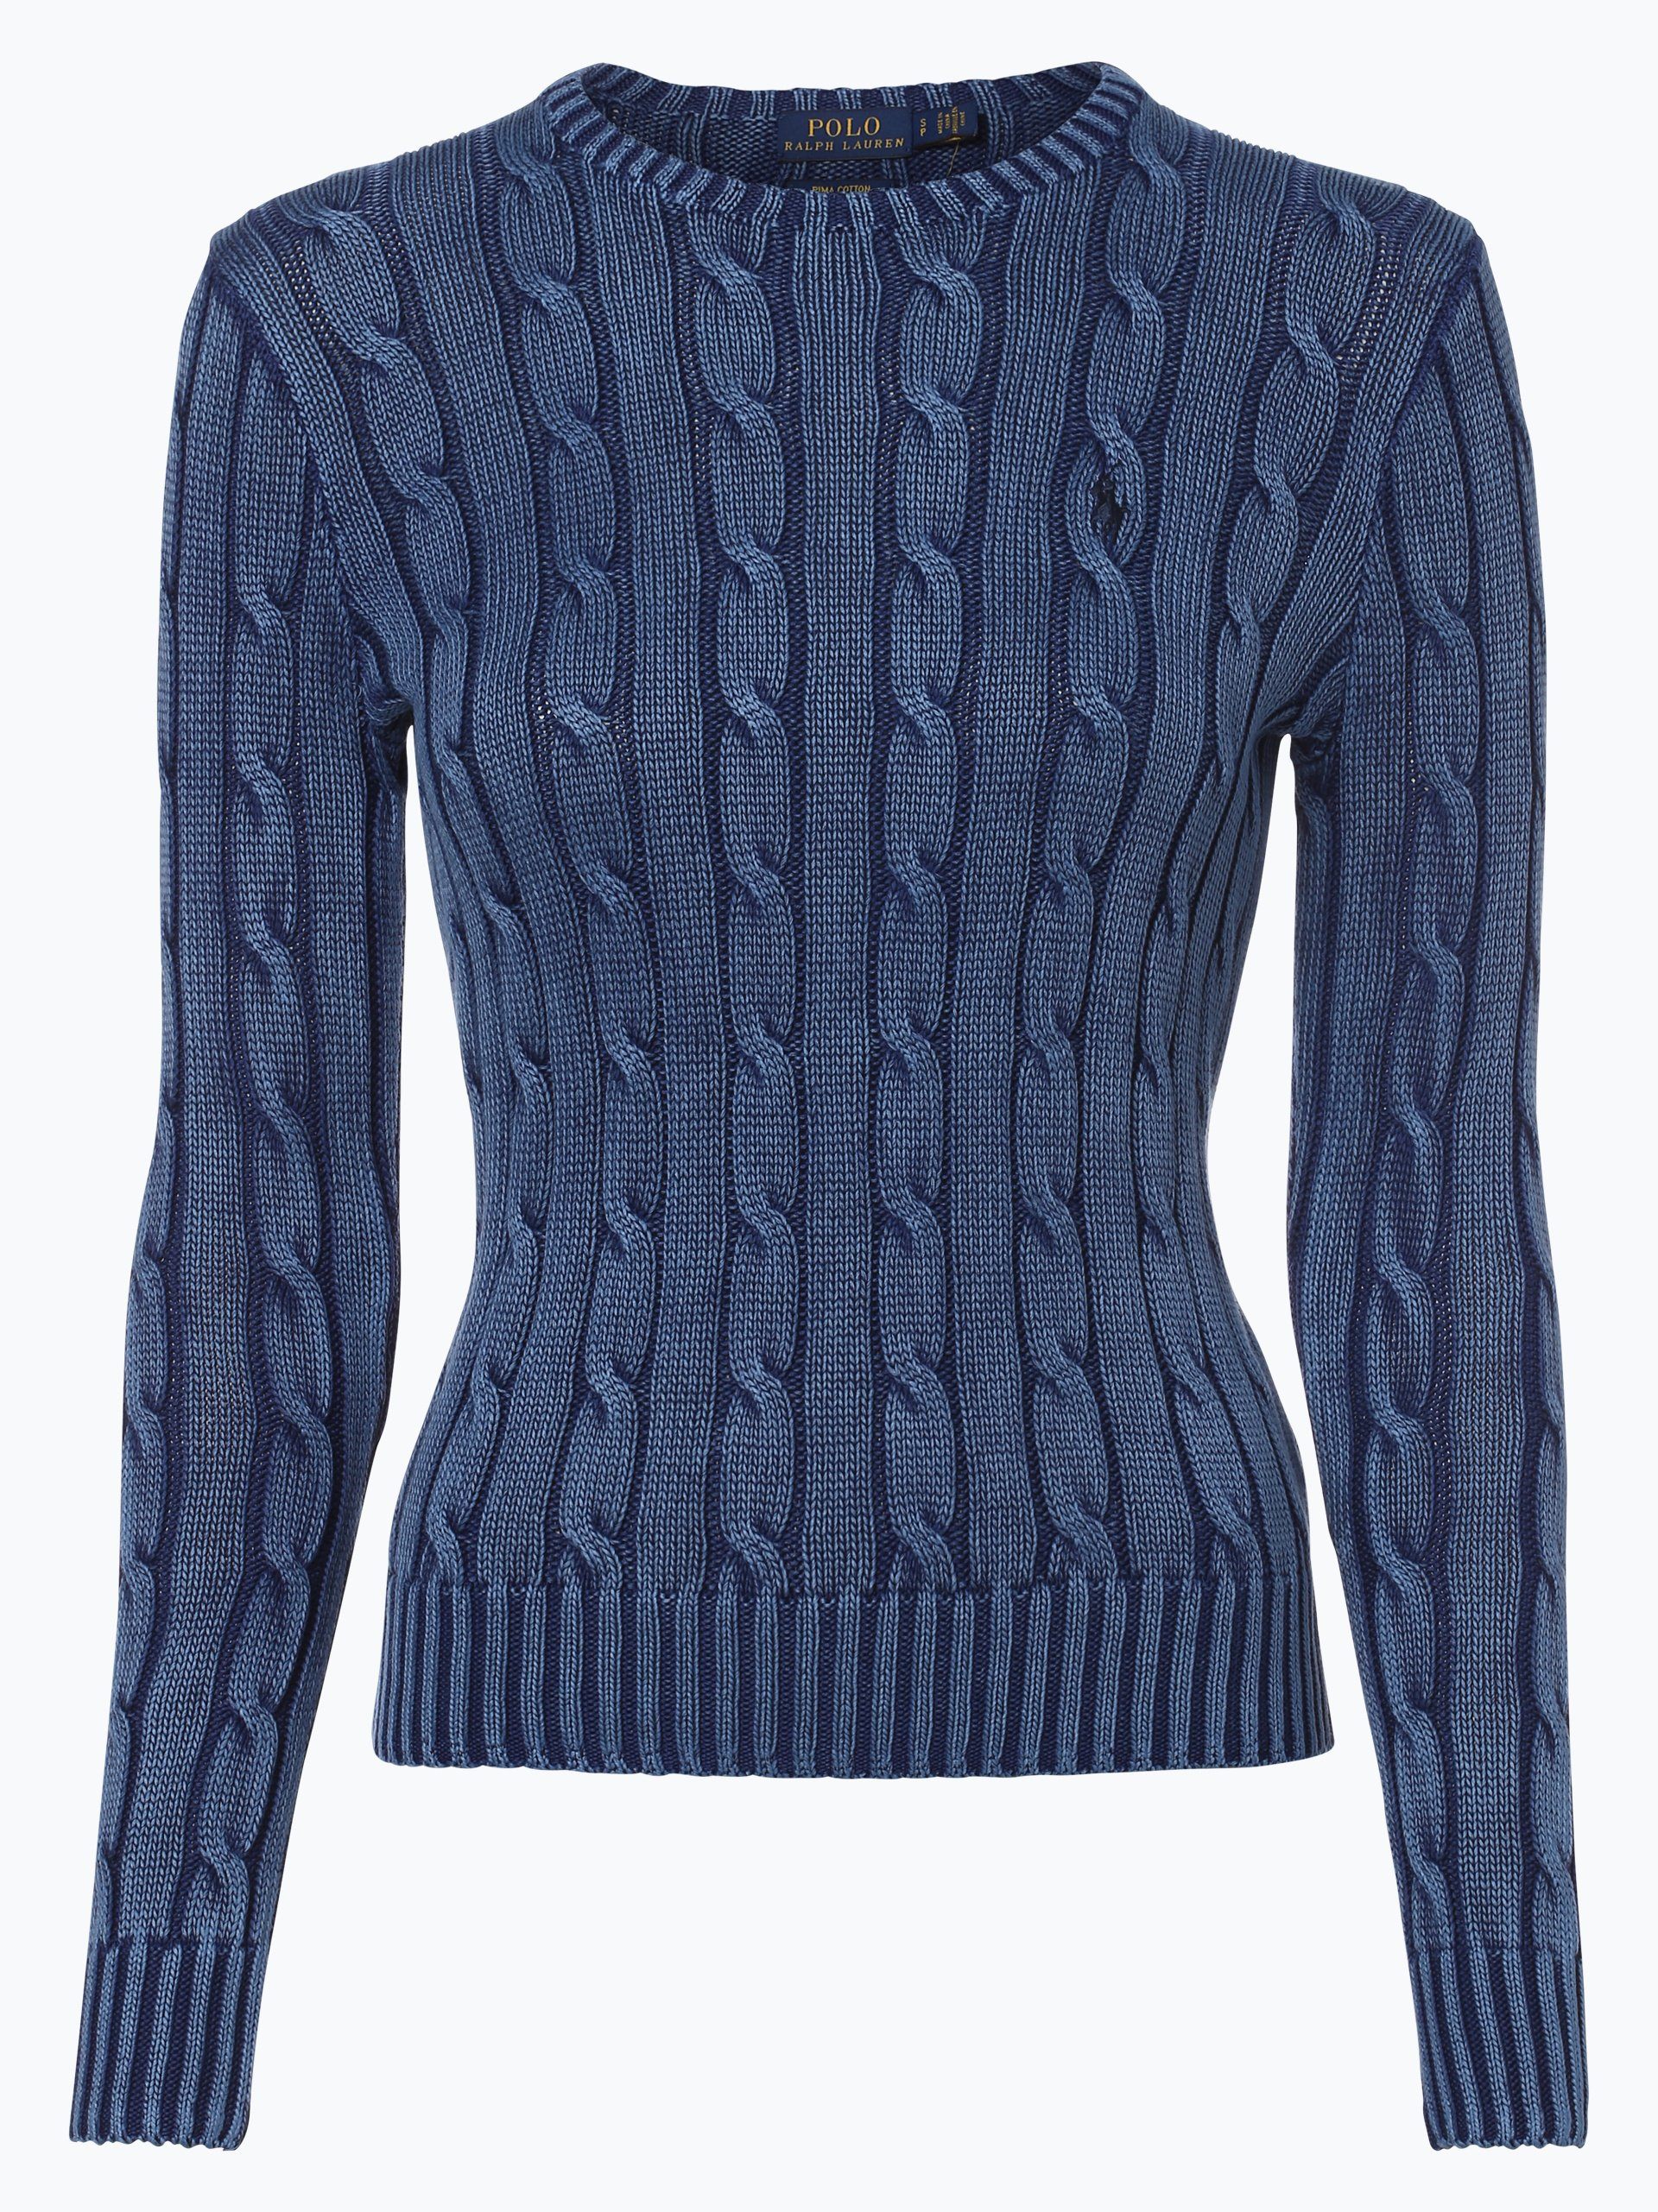 polo ralph lauren damen pullover indigo uni online kaufen. Black Bedroom Furniture Sets. Home Design Ideas